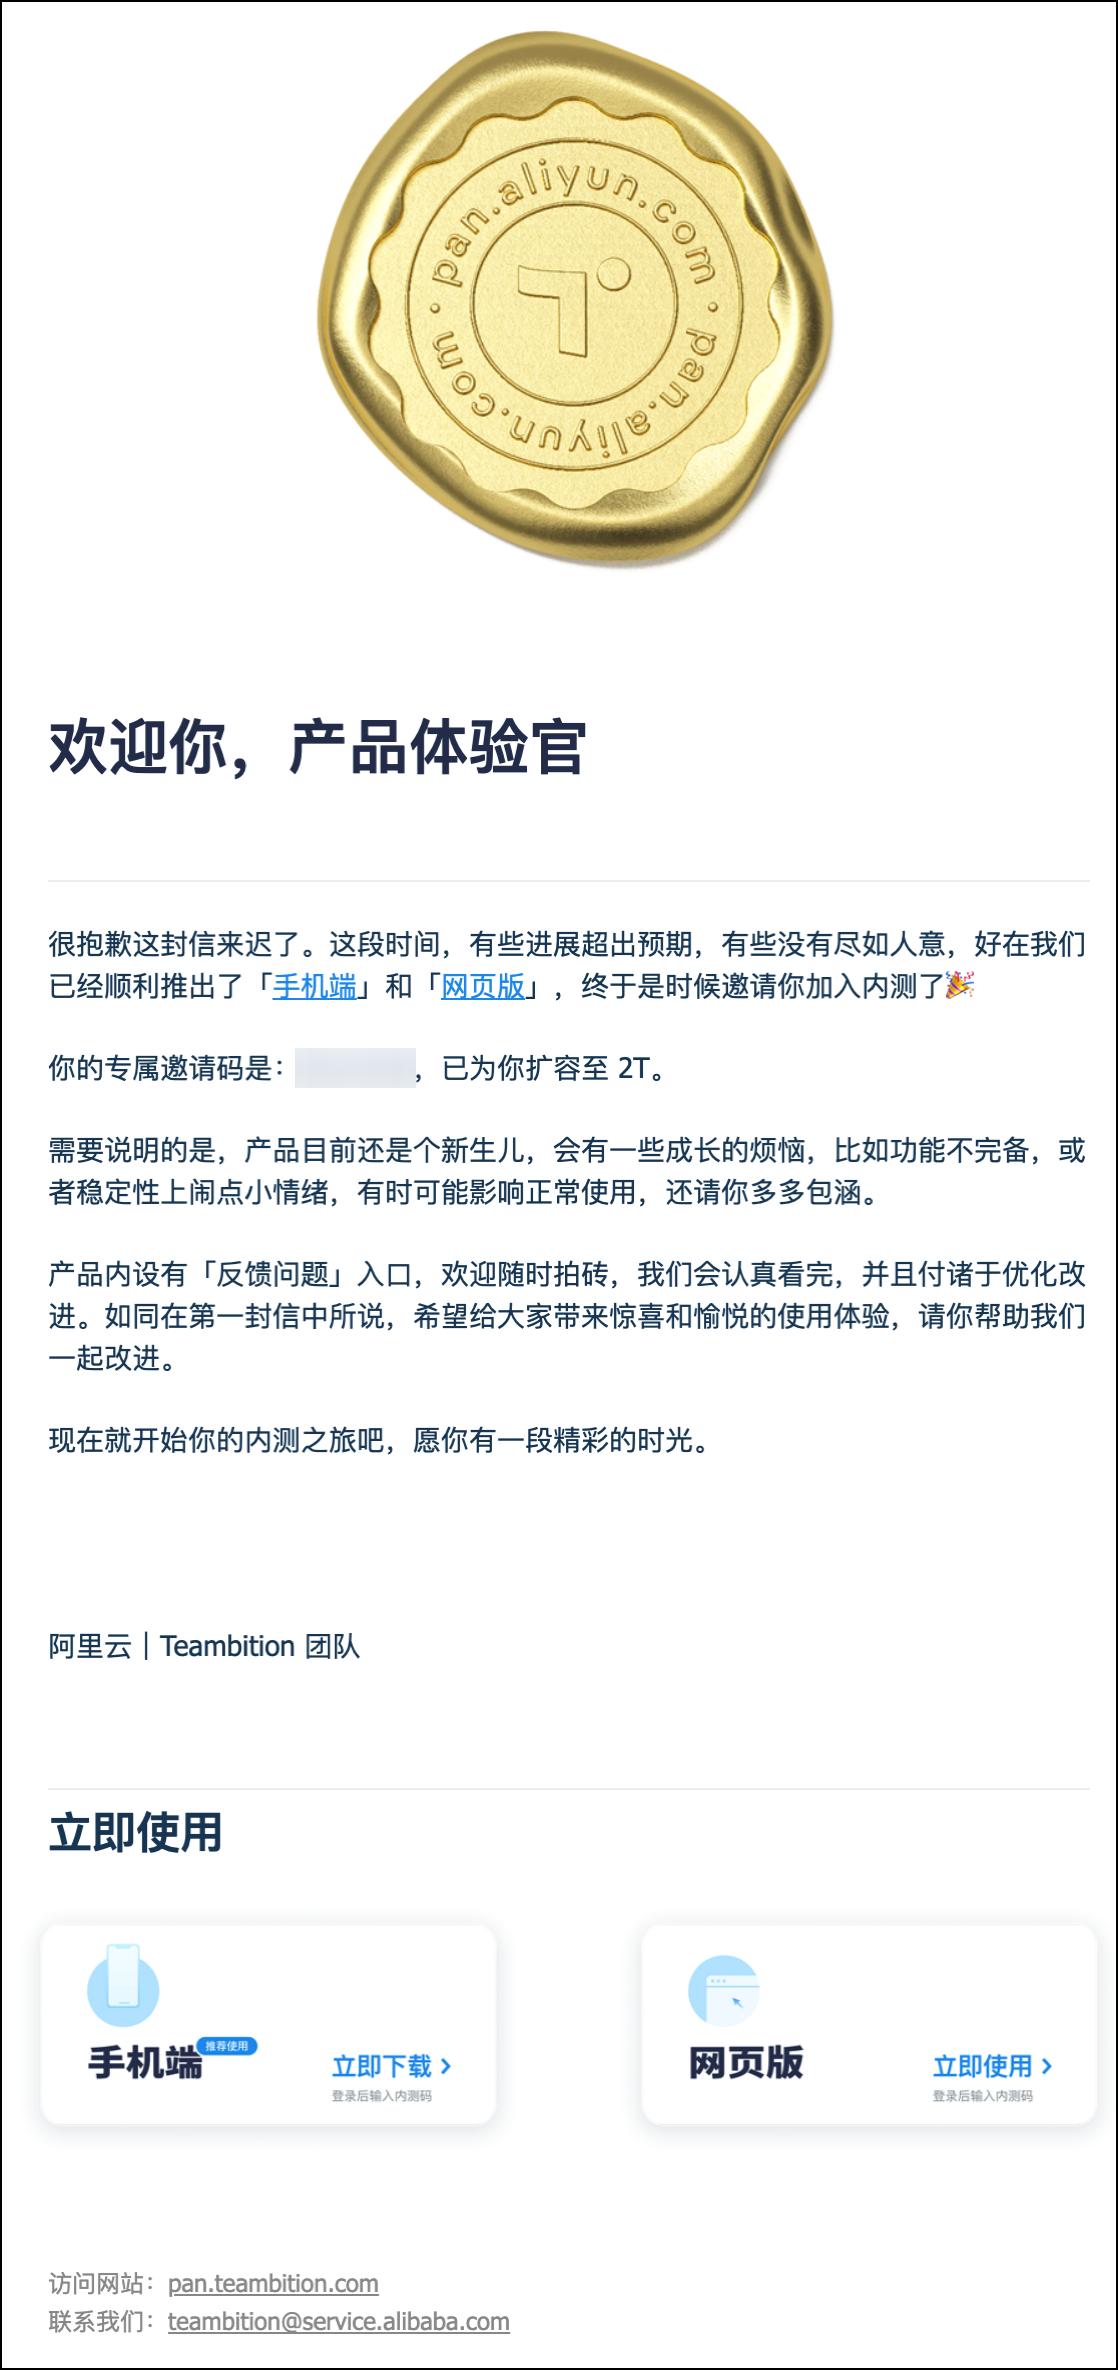 Teambition 网盘邀请邮件